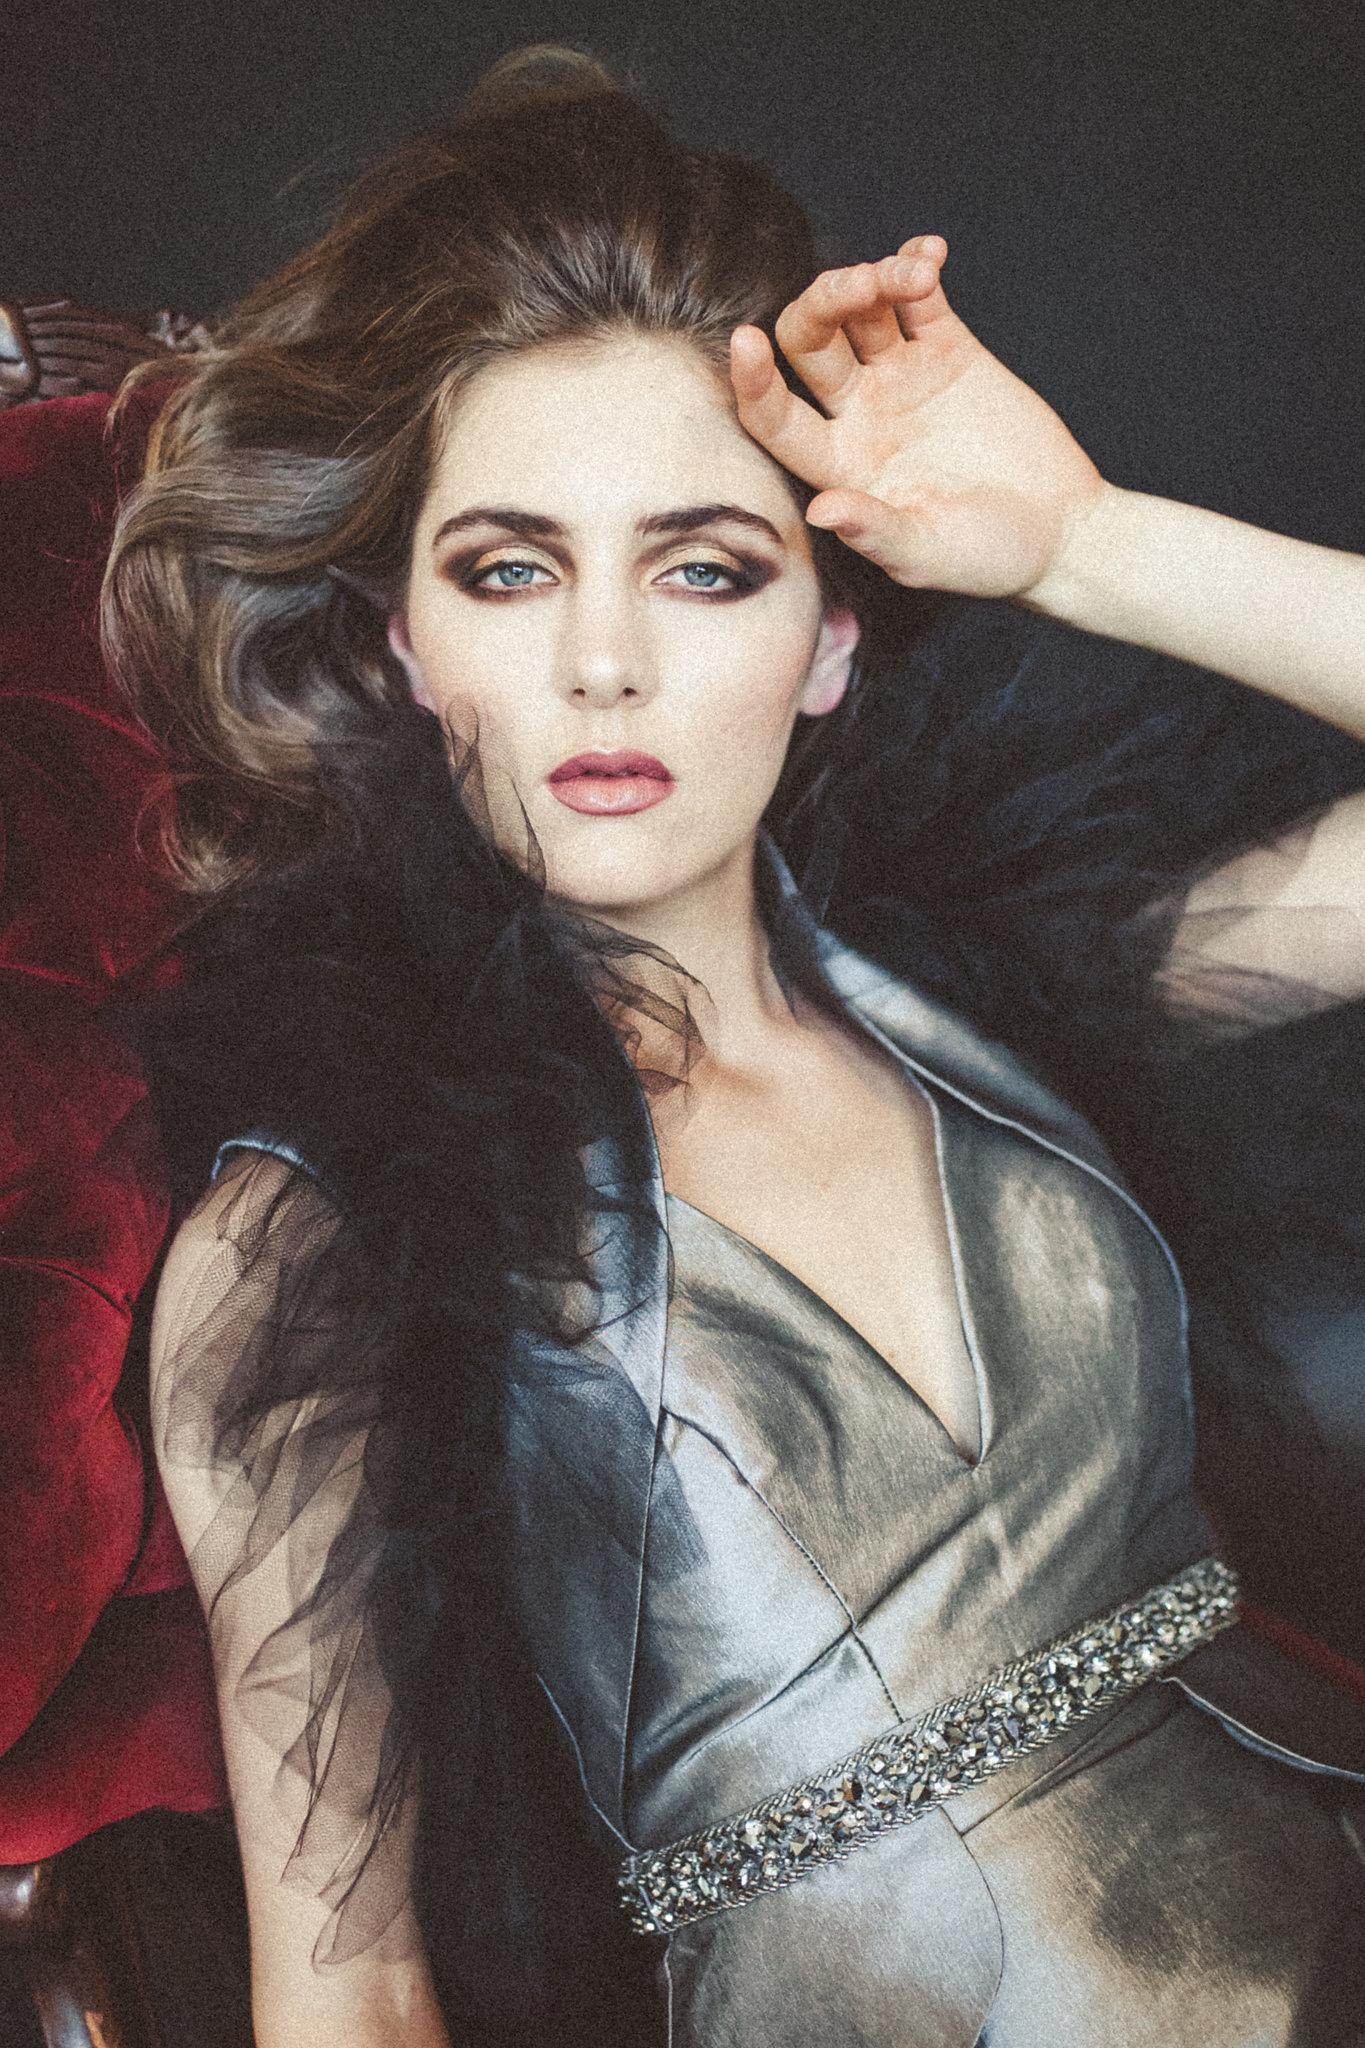 Photography:   Connie Marina | Makeup: Emily Juarez | Style: Icon Stylist | Model: Salt Model & Talent | Fashion: Badgley Mischka, Mac Duggal, Bel Fiore Bridal